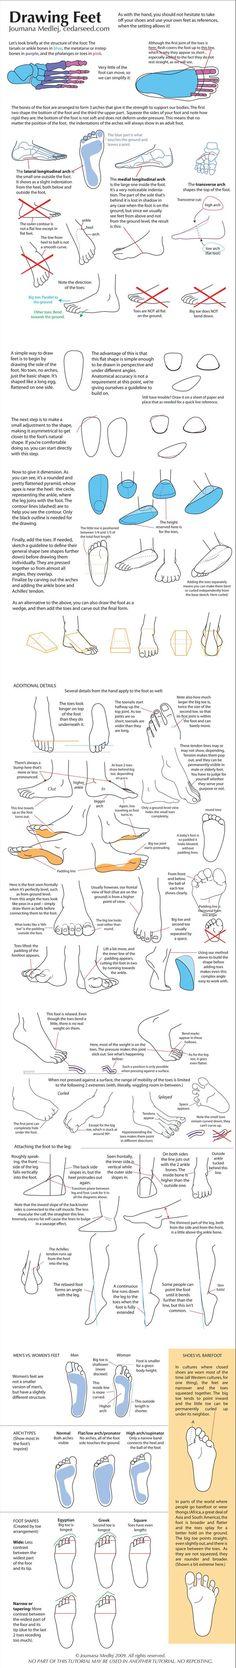 drawing feet: